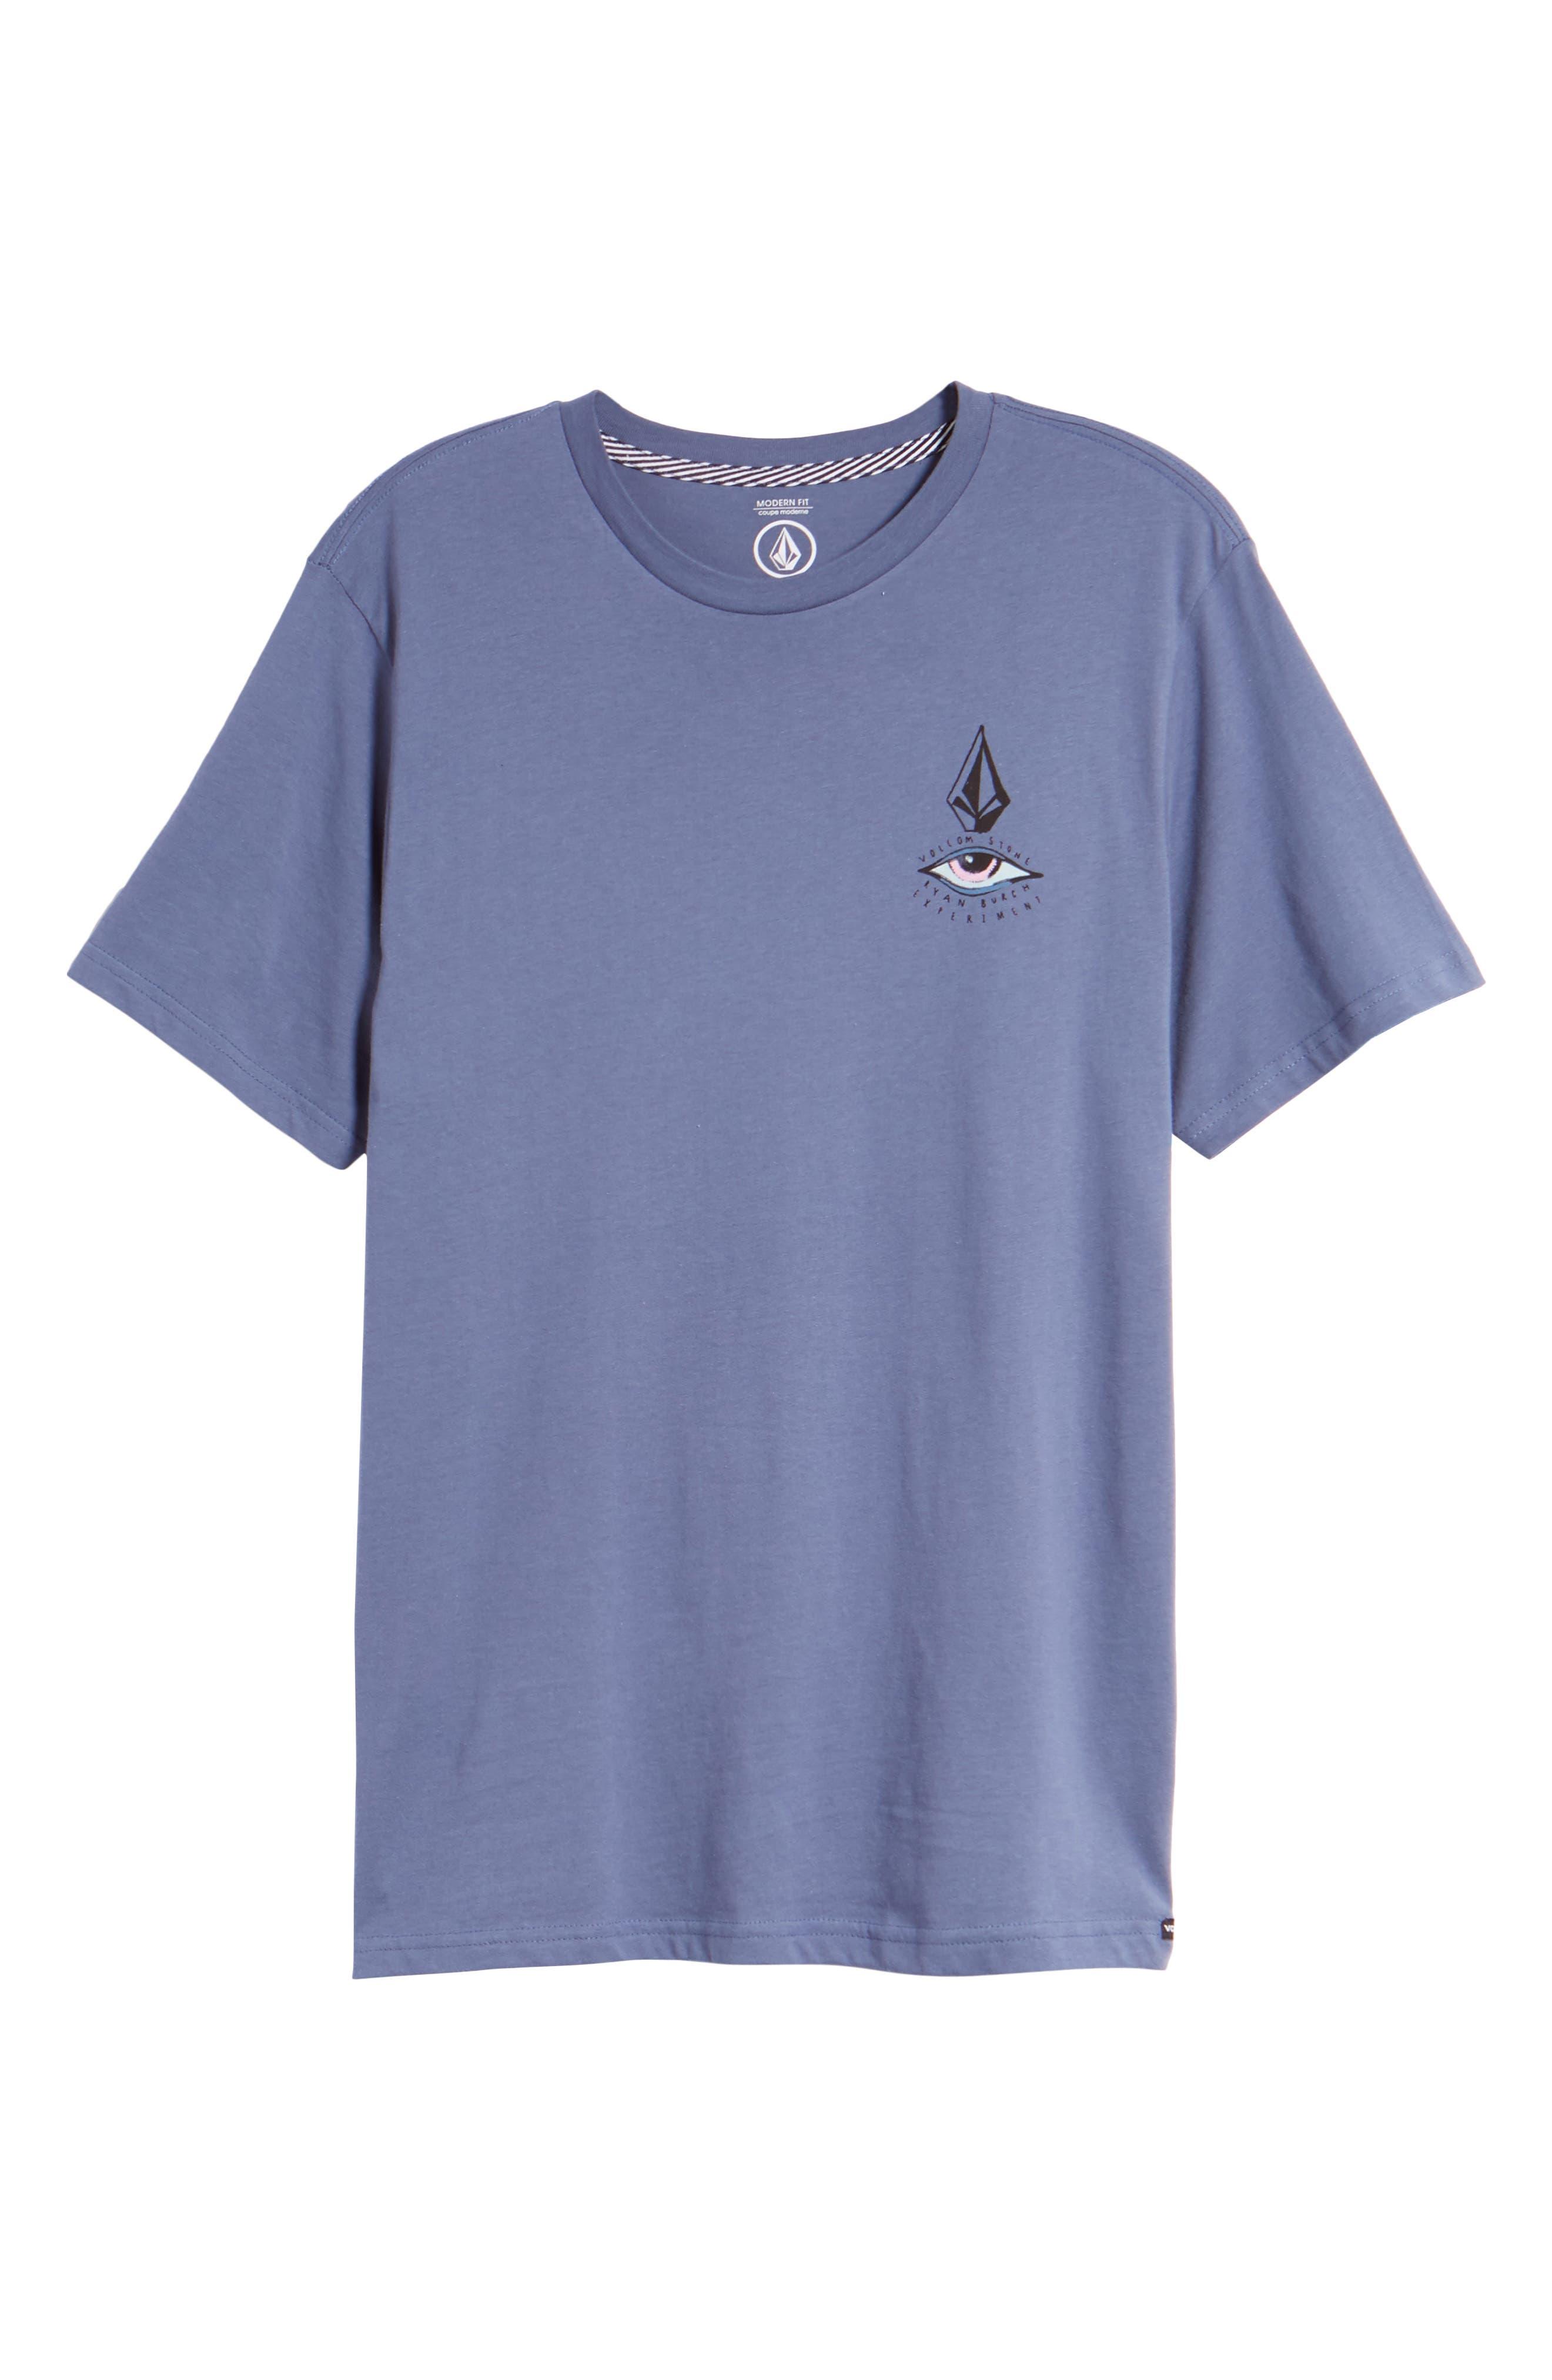 Burch Eye Graphic T-Shirt,                             Alternate thumbnail 6, color,                             Deep Blue